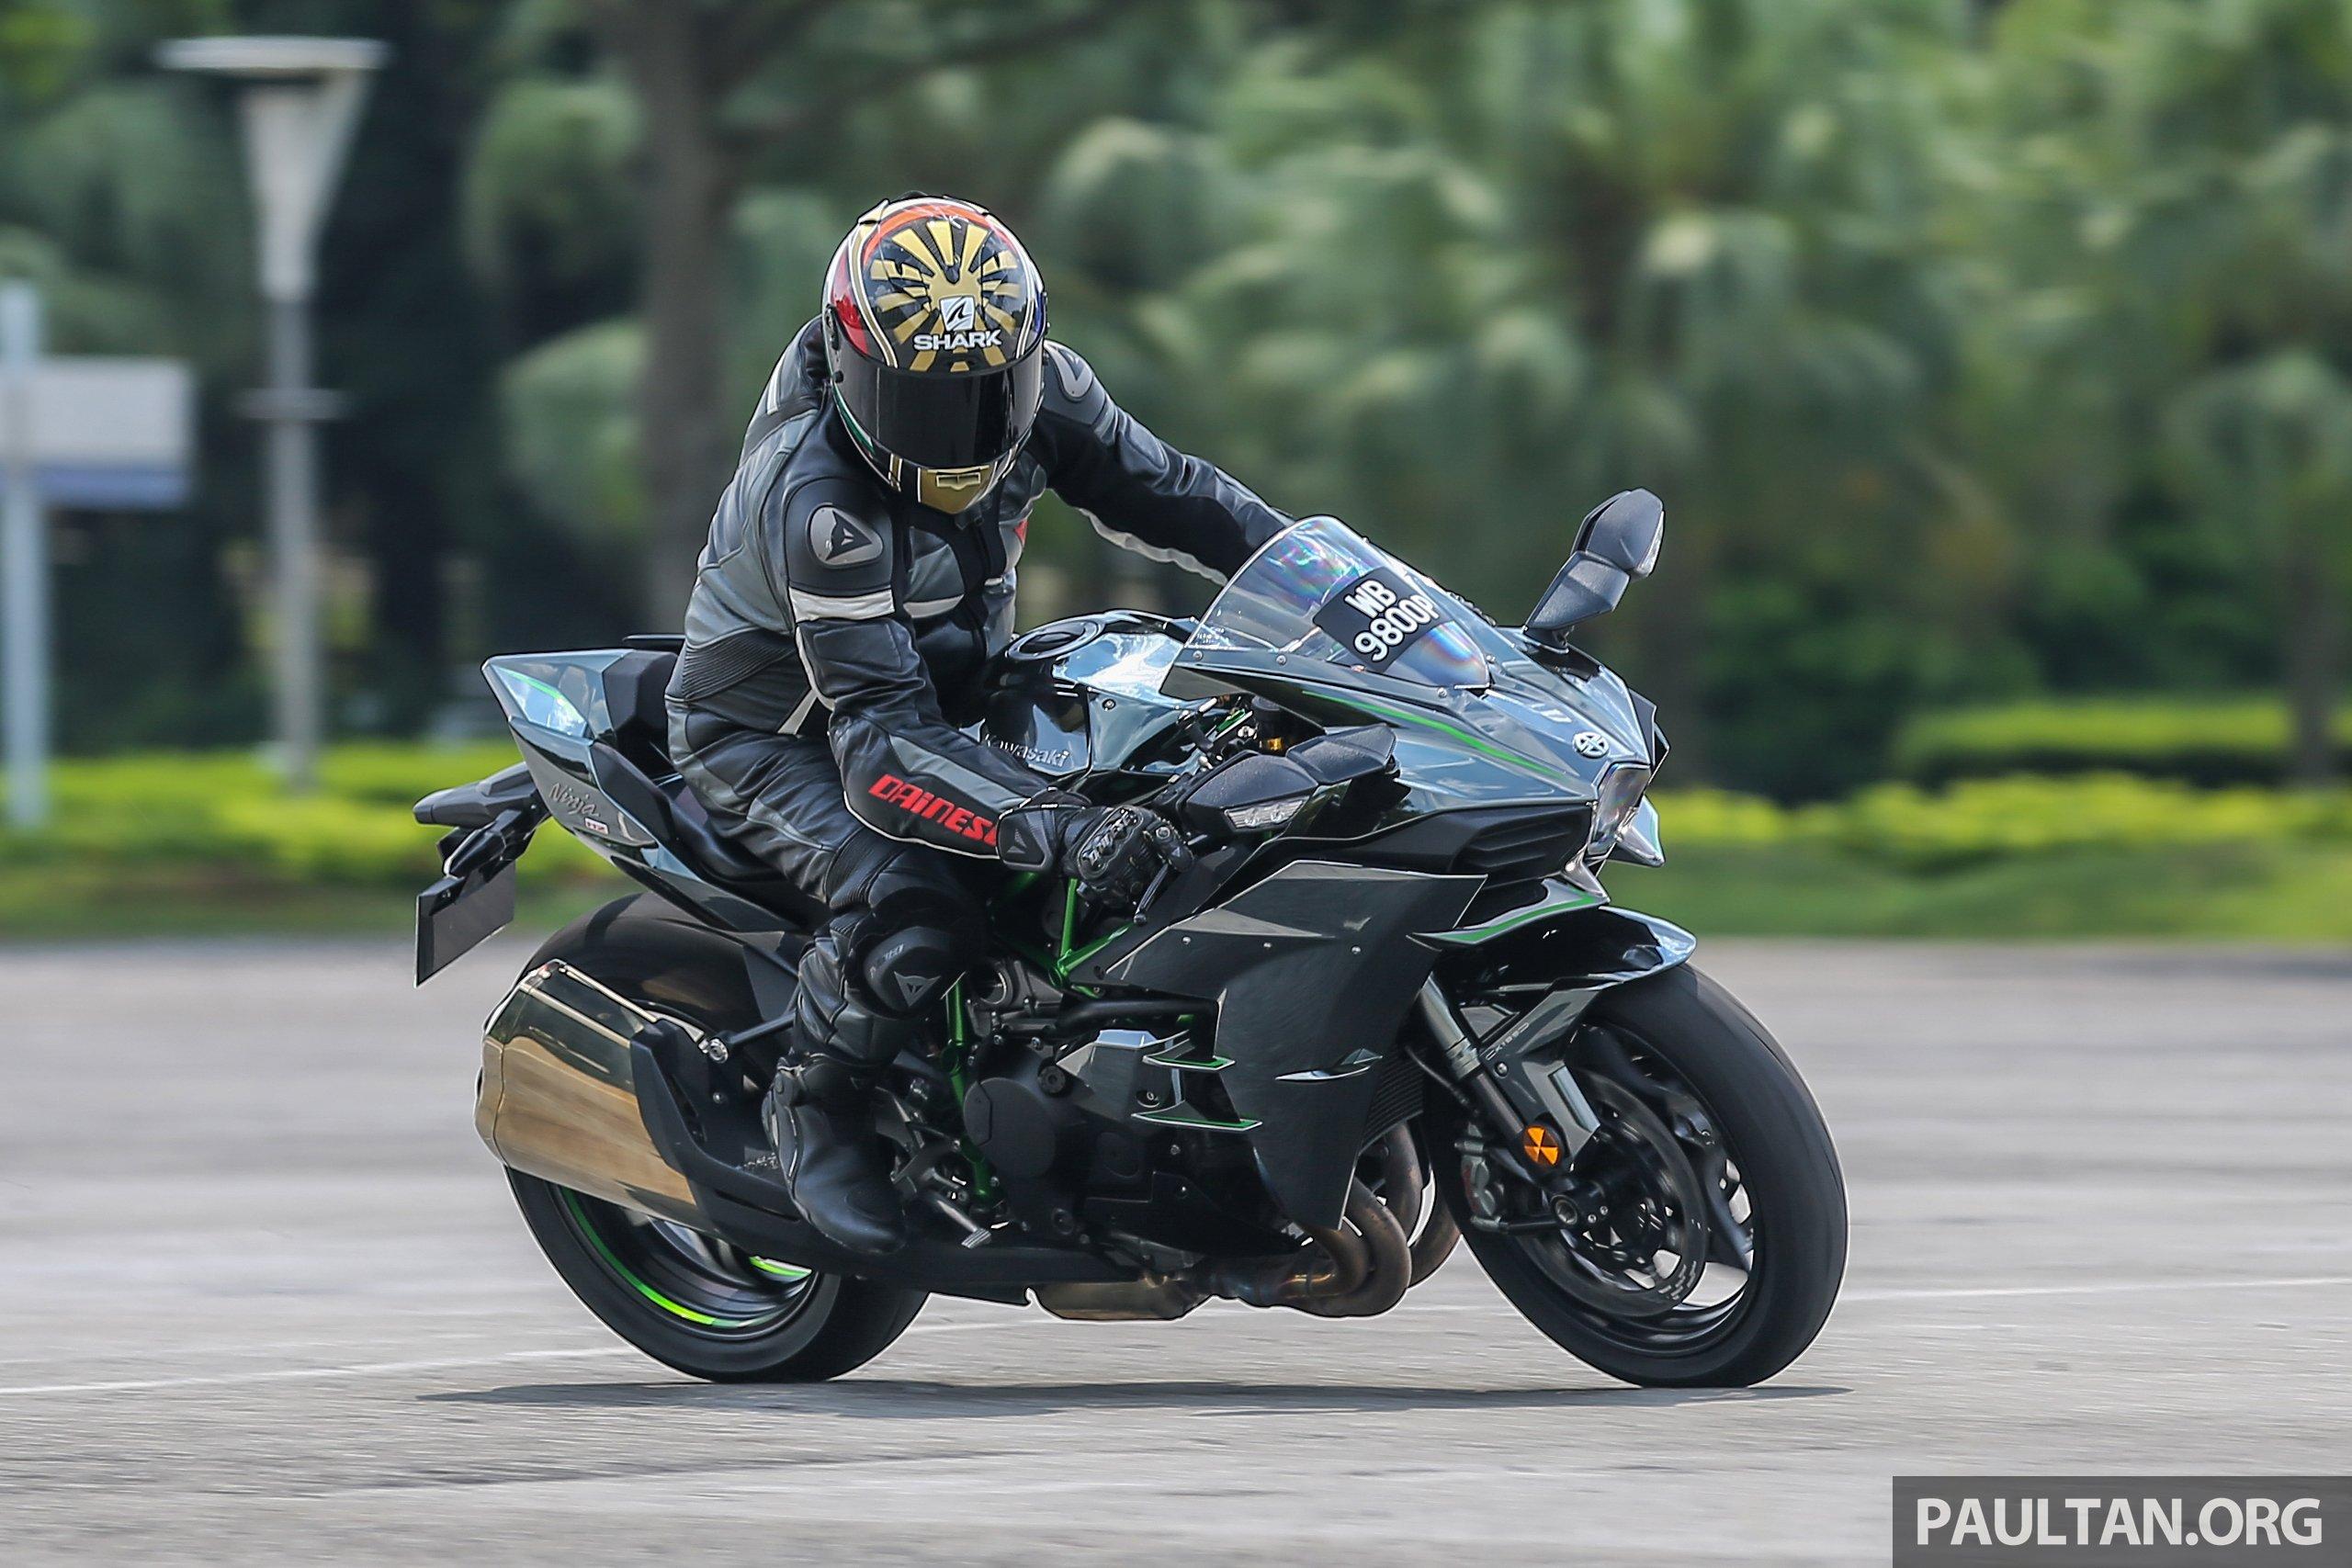 Review Kawasaki Ninja H2 Power To The People